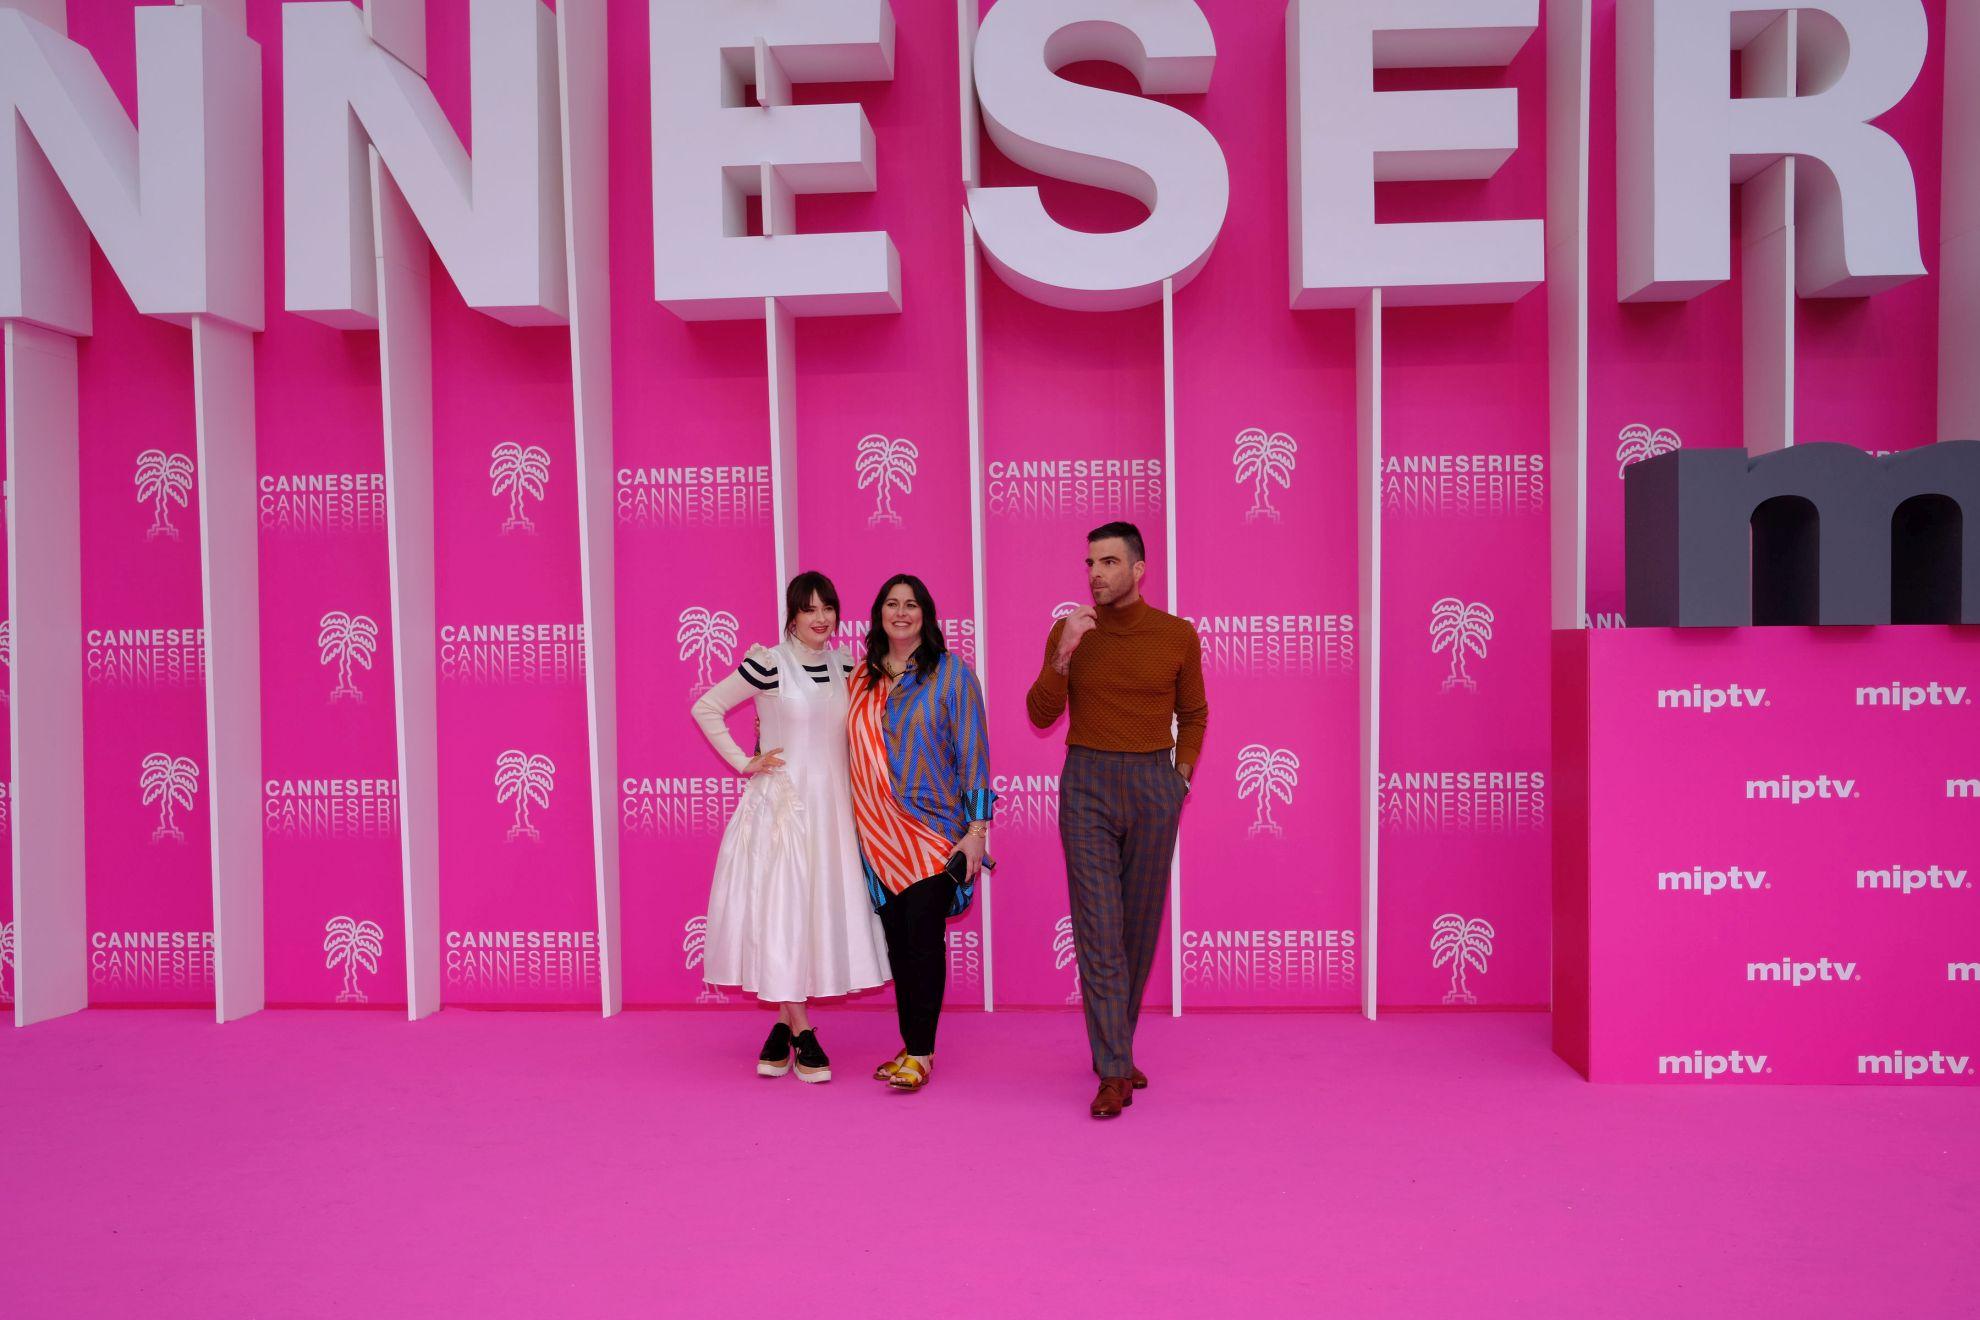 Canneseries 2019: il cast del serial NOS4A2 sul pink carpet